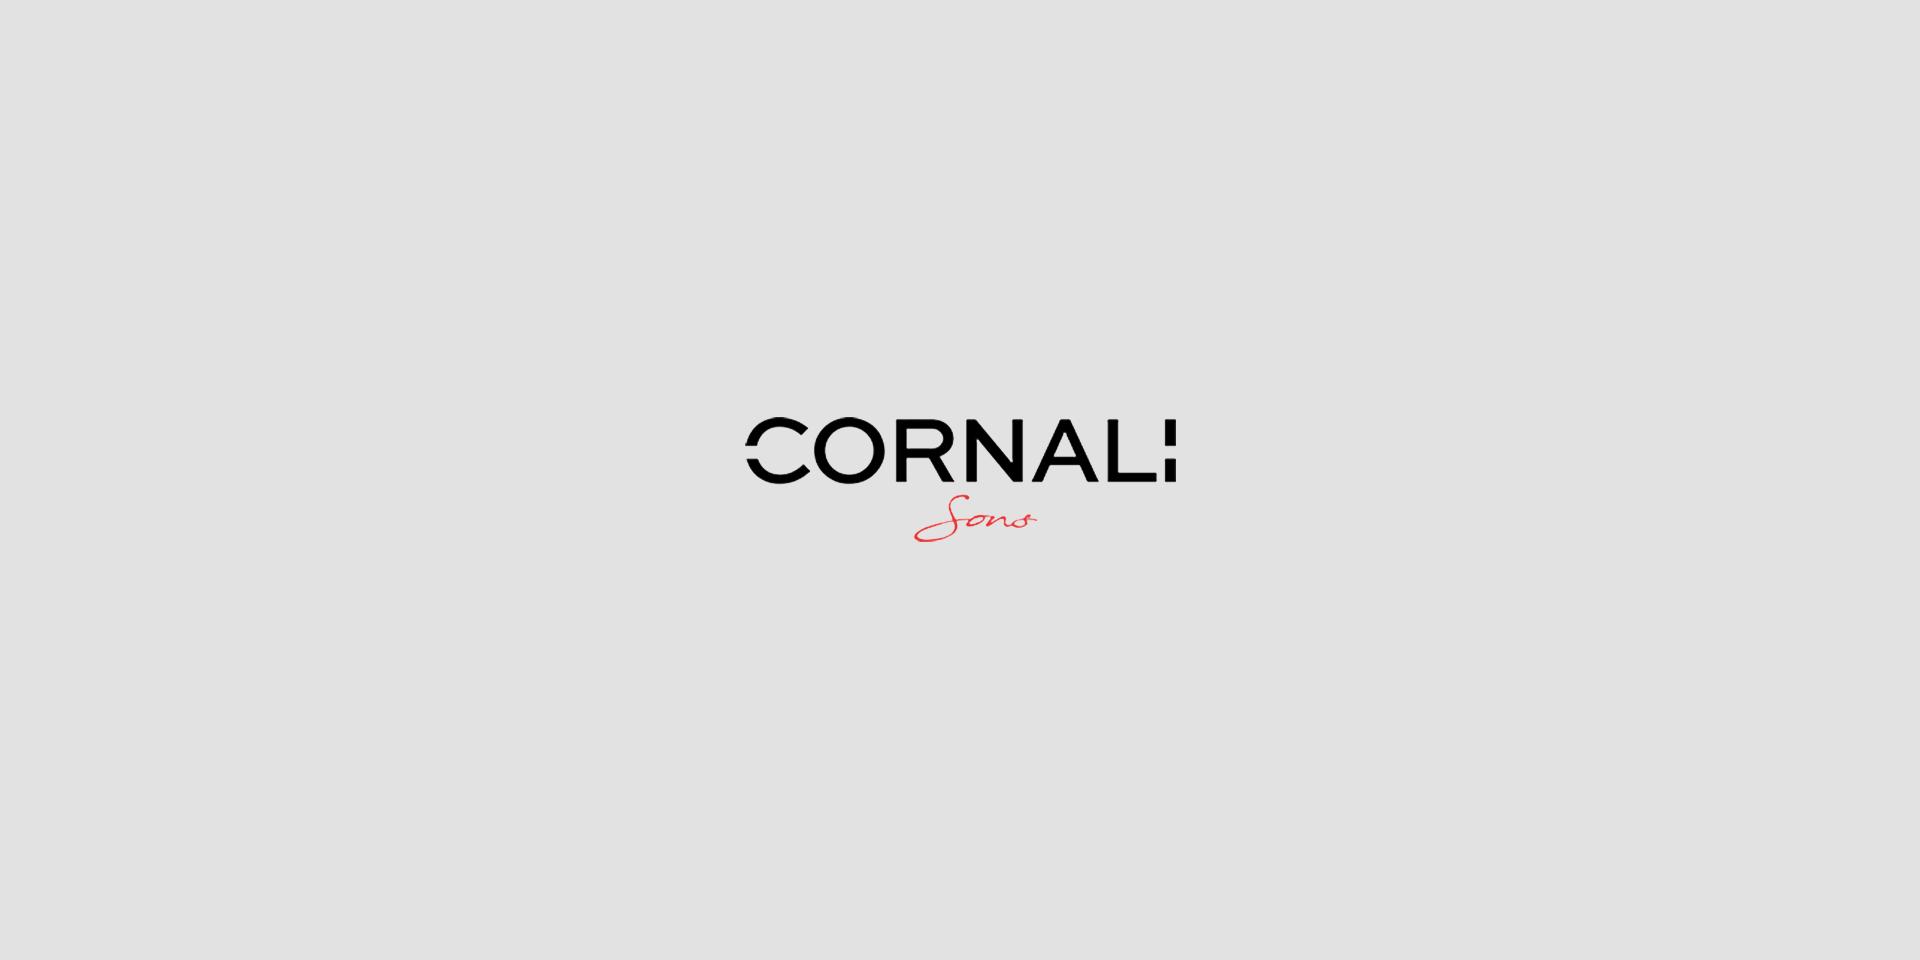 APERTURA CORNALI SONS